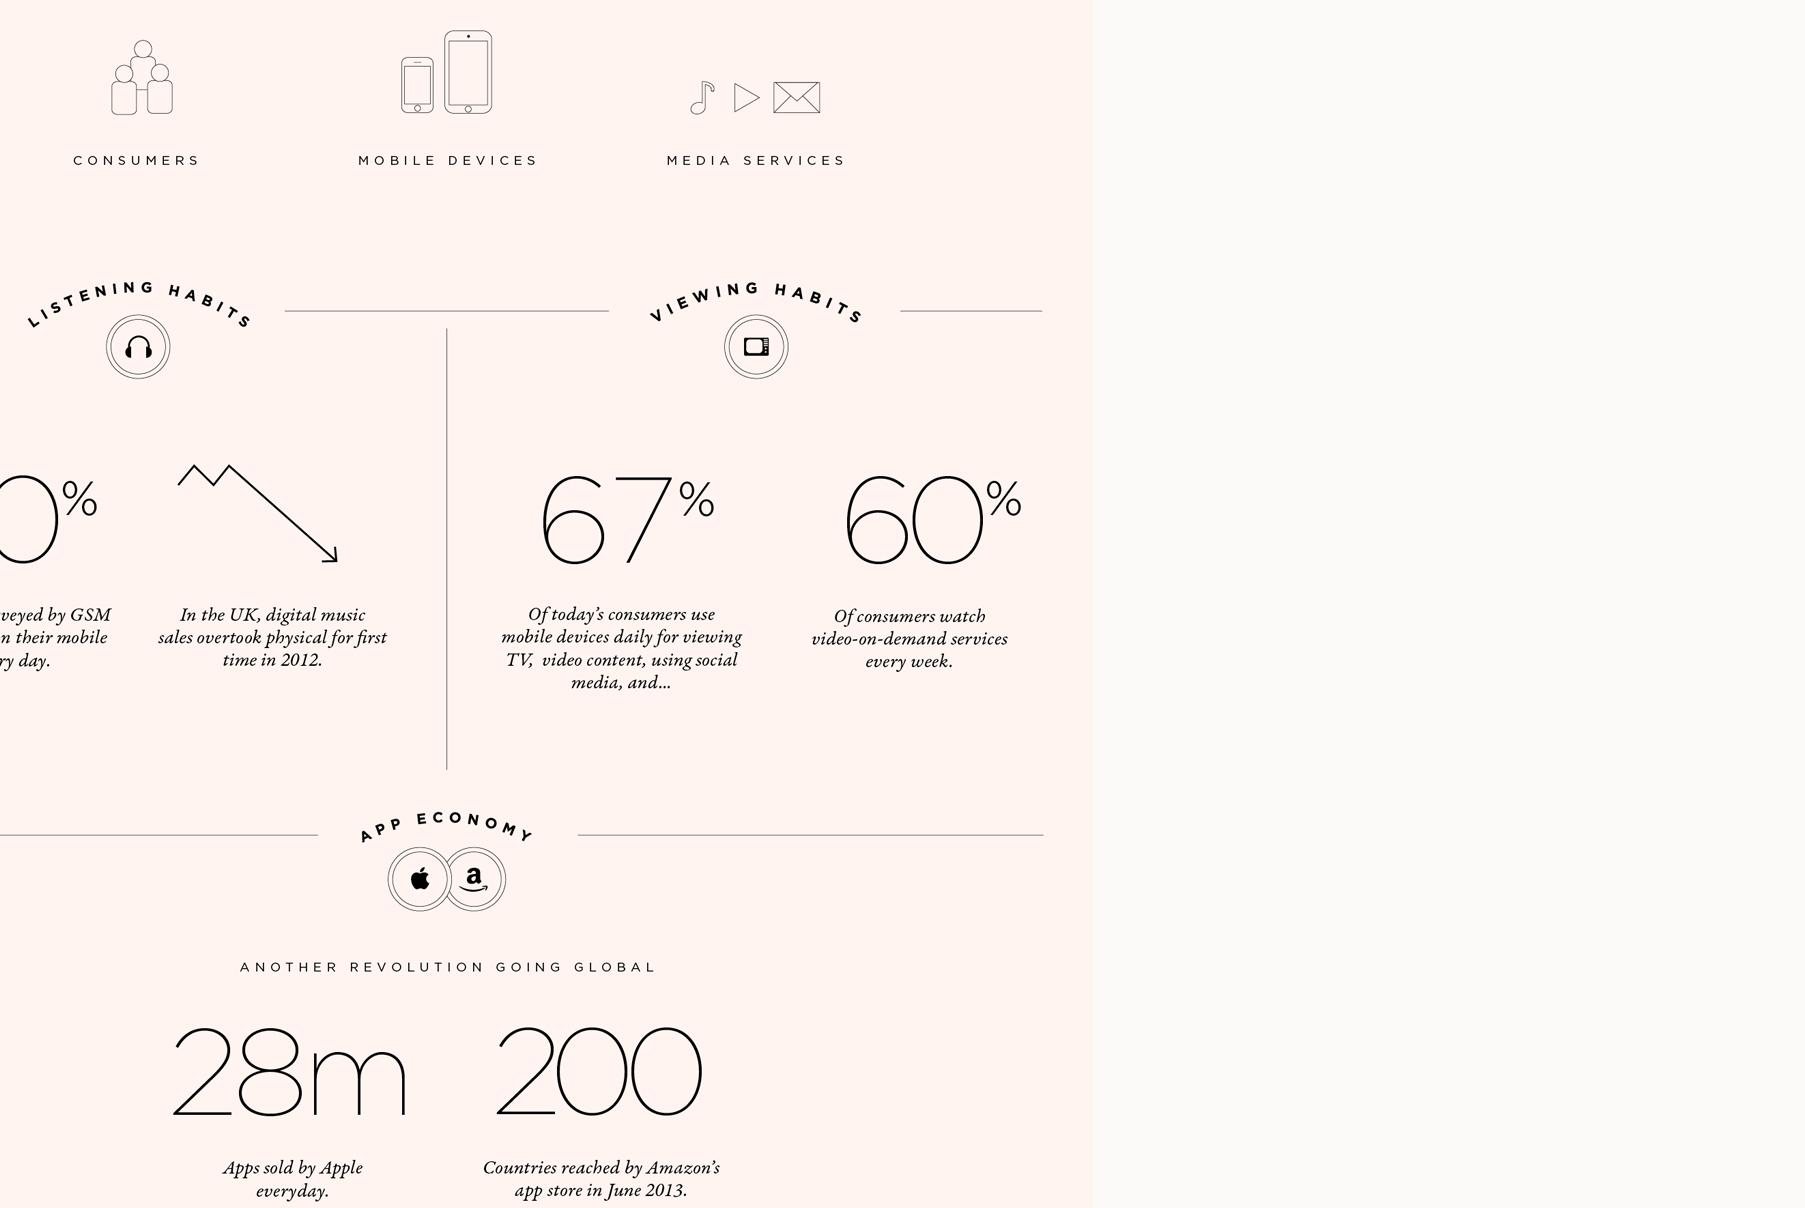 marta_Vargas_infographic_6.jpg